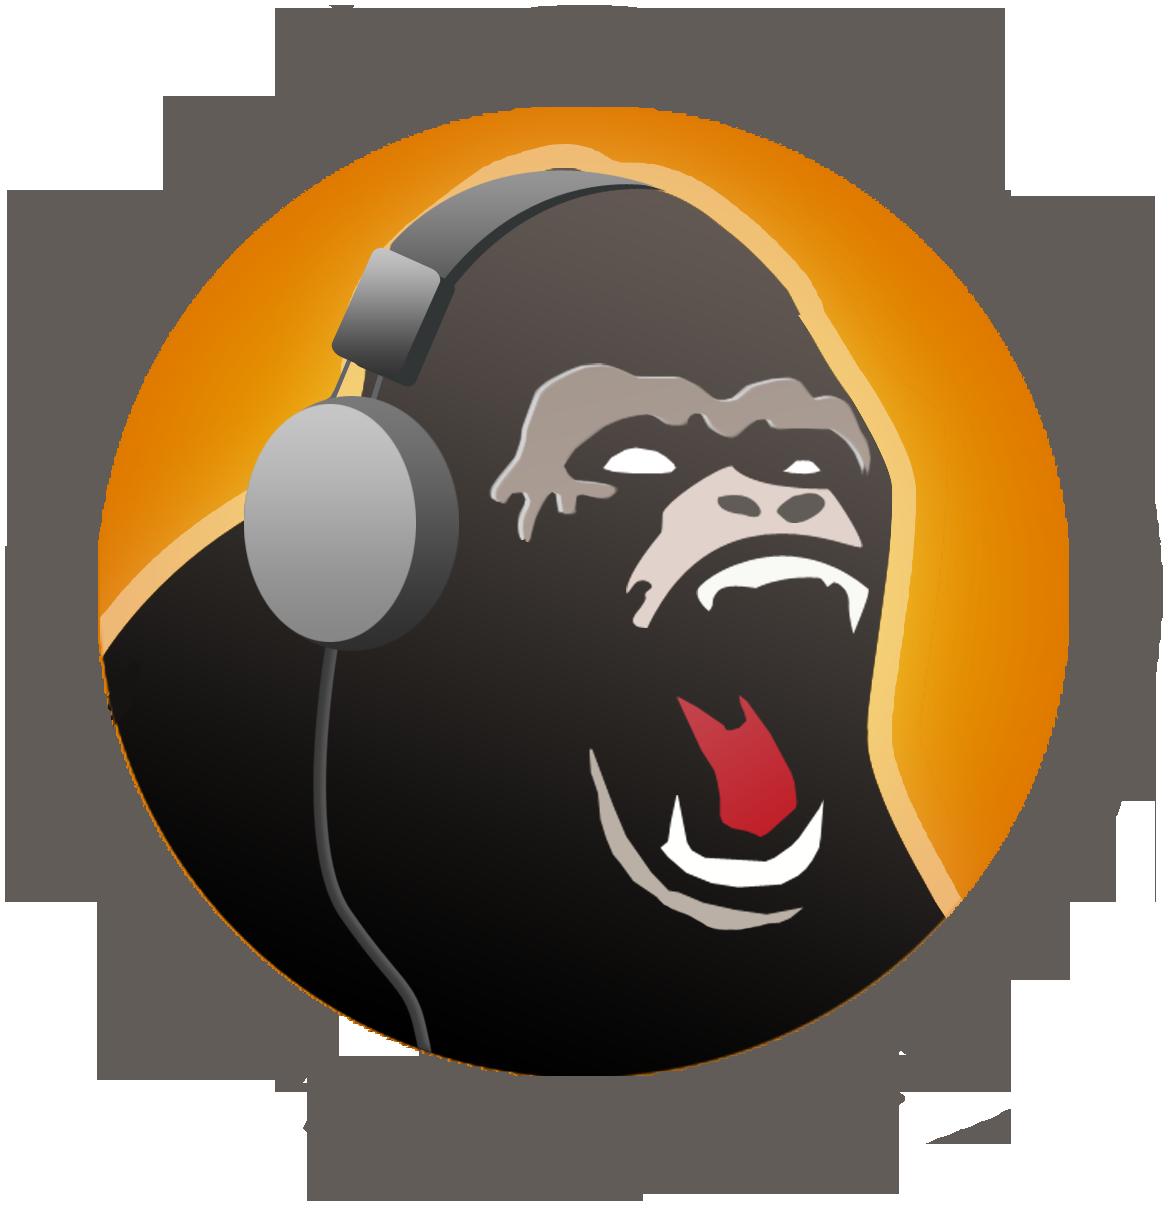 Festirock